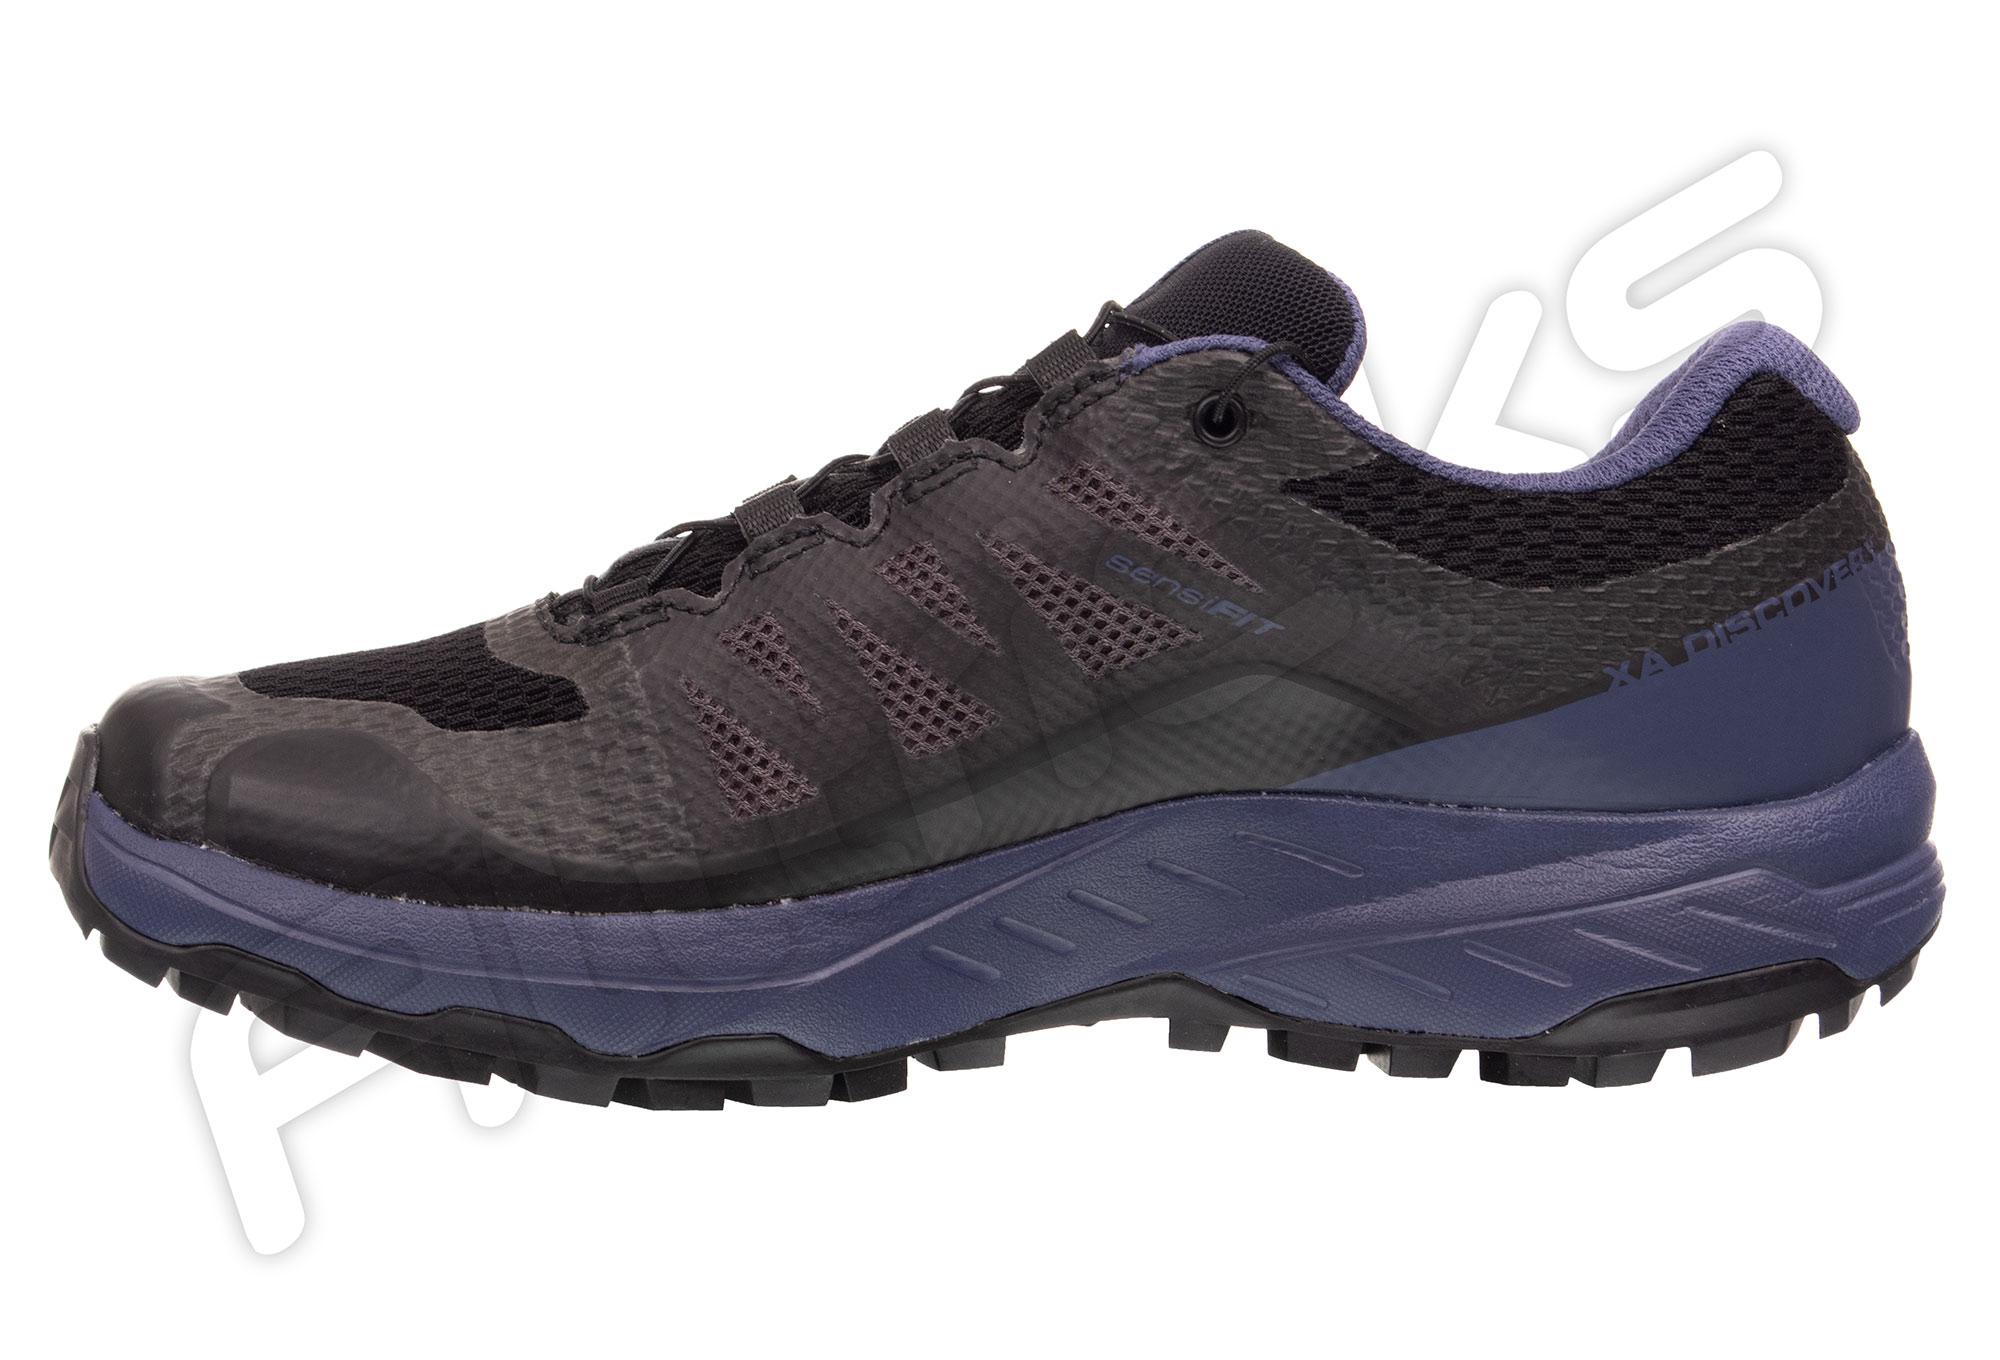 Salomon XA Discovery GTX Women's Shoes Black